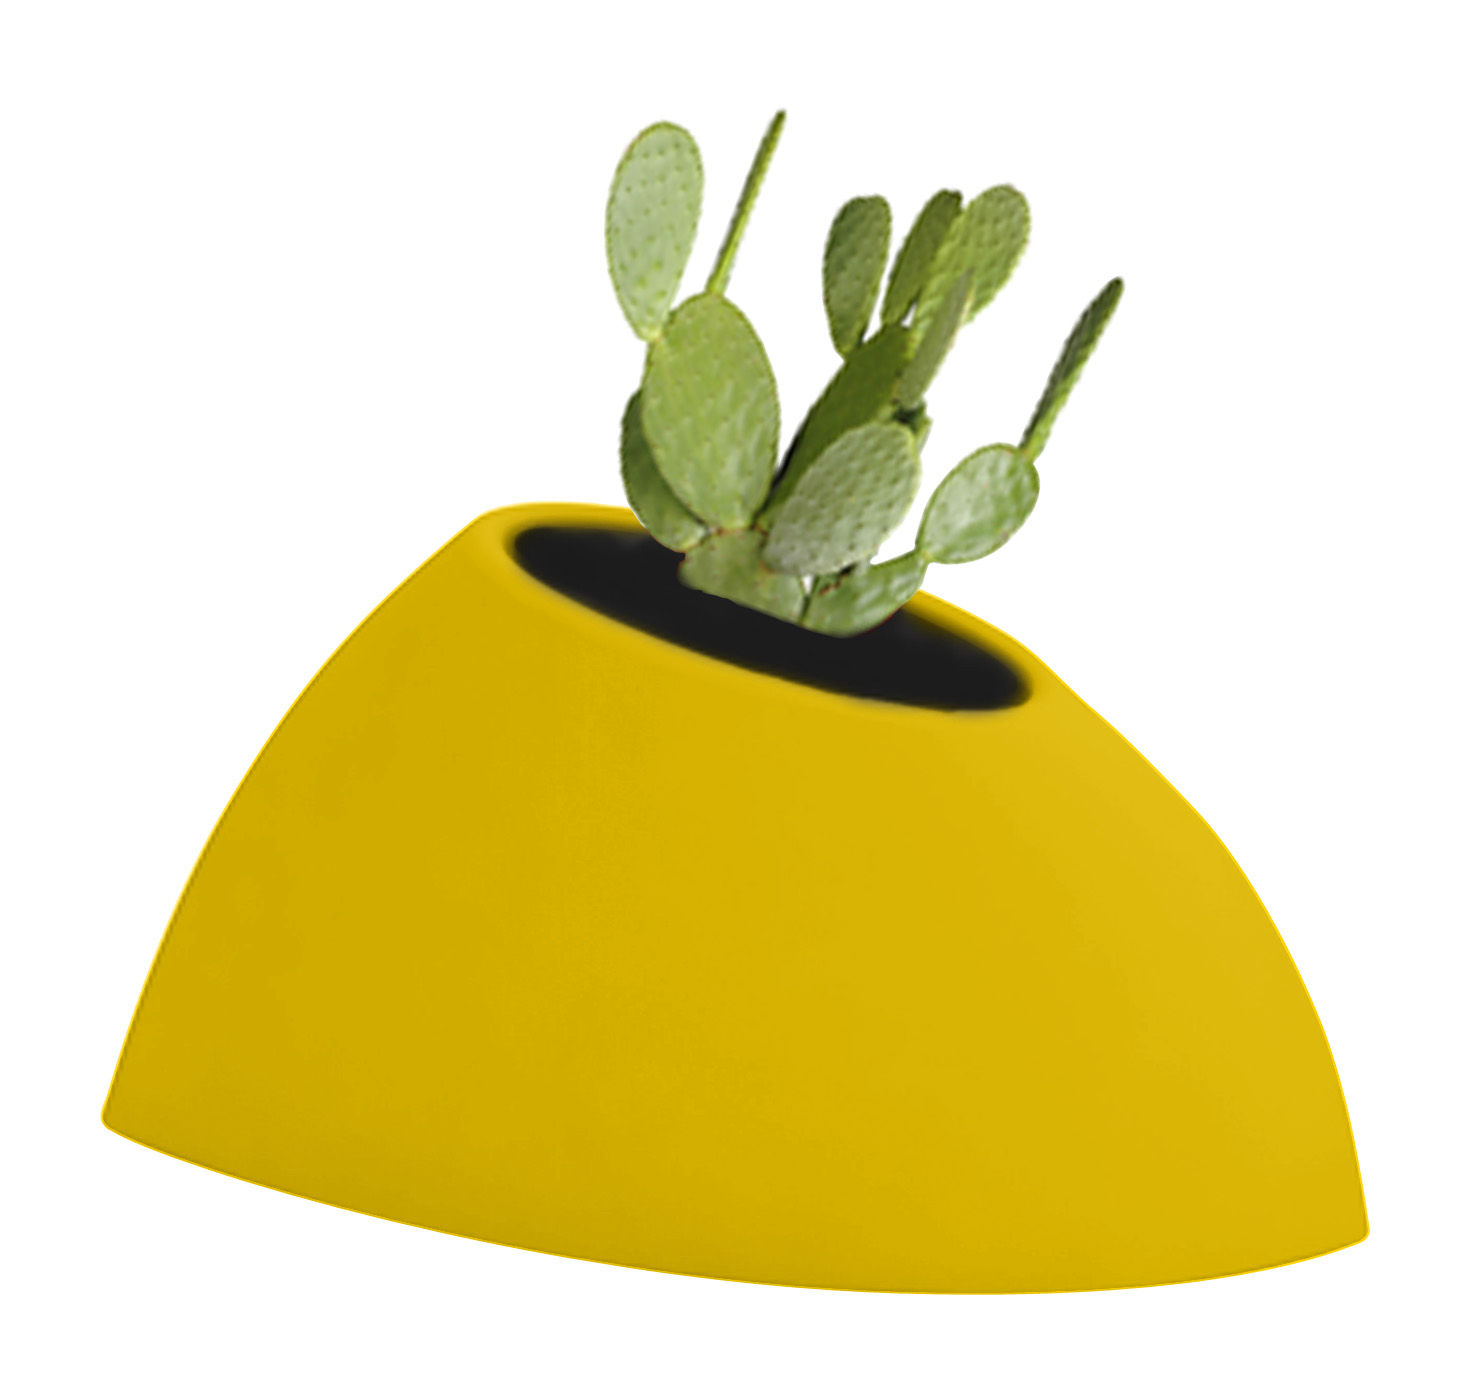 Outdoor - Töpfe und Pflanzen - Tao S Blumentopf H 36 cm - MyYour - Gelb - rotationsgeformtes Polyäthylen